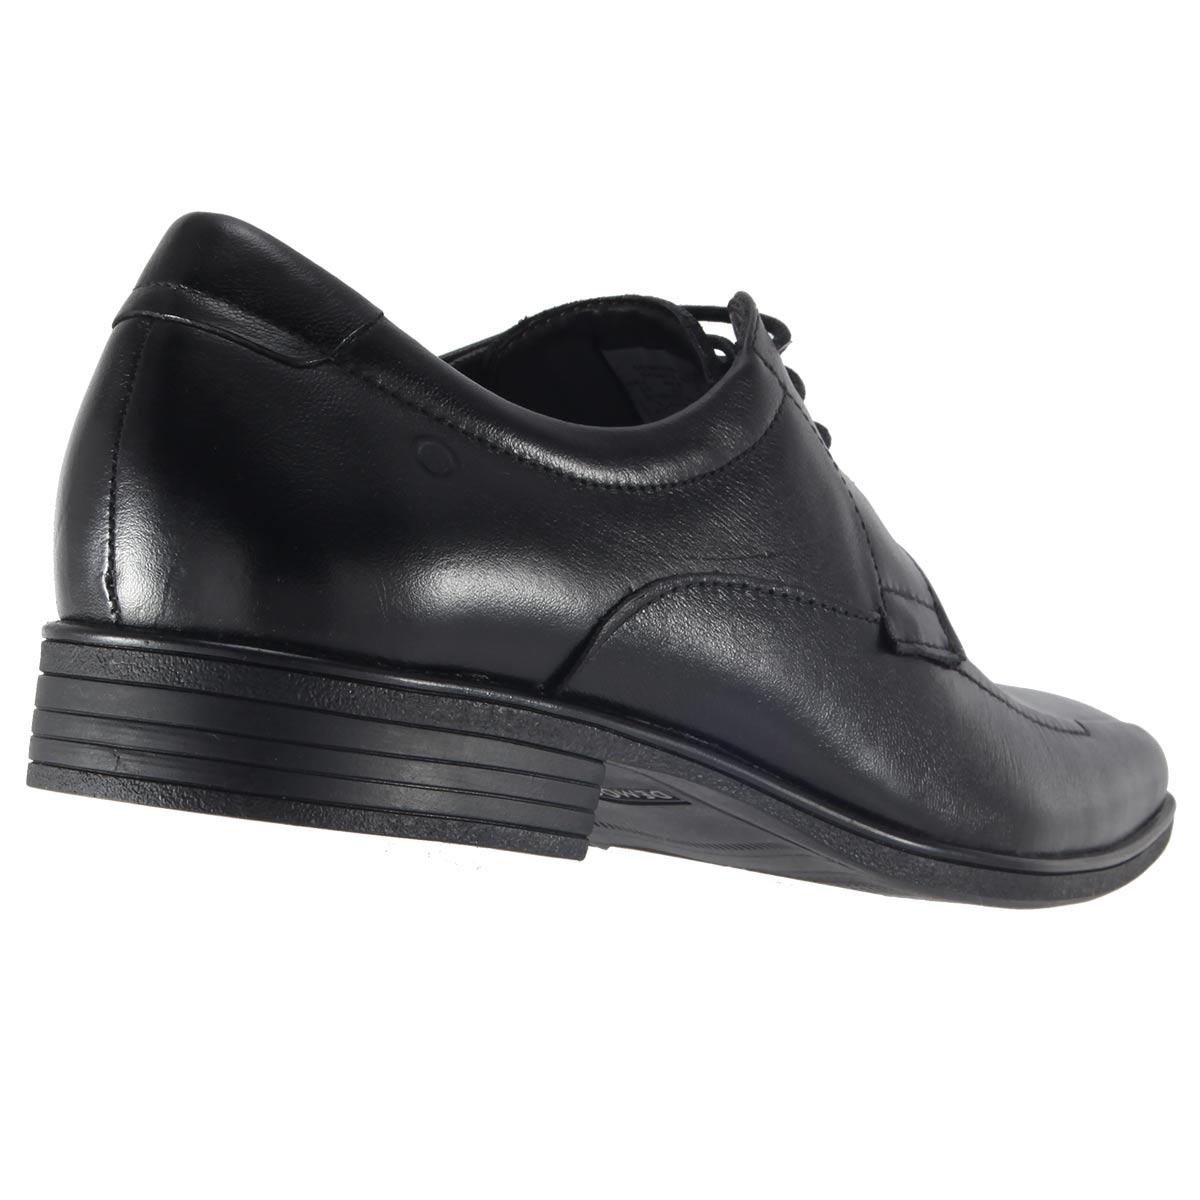 Sapato Social Democrata Alpha Flex Masculino Couro Cadarço 045012